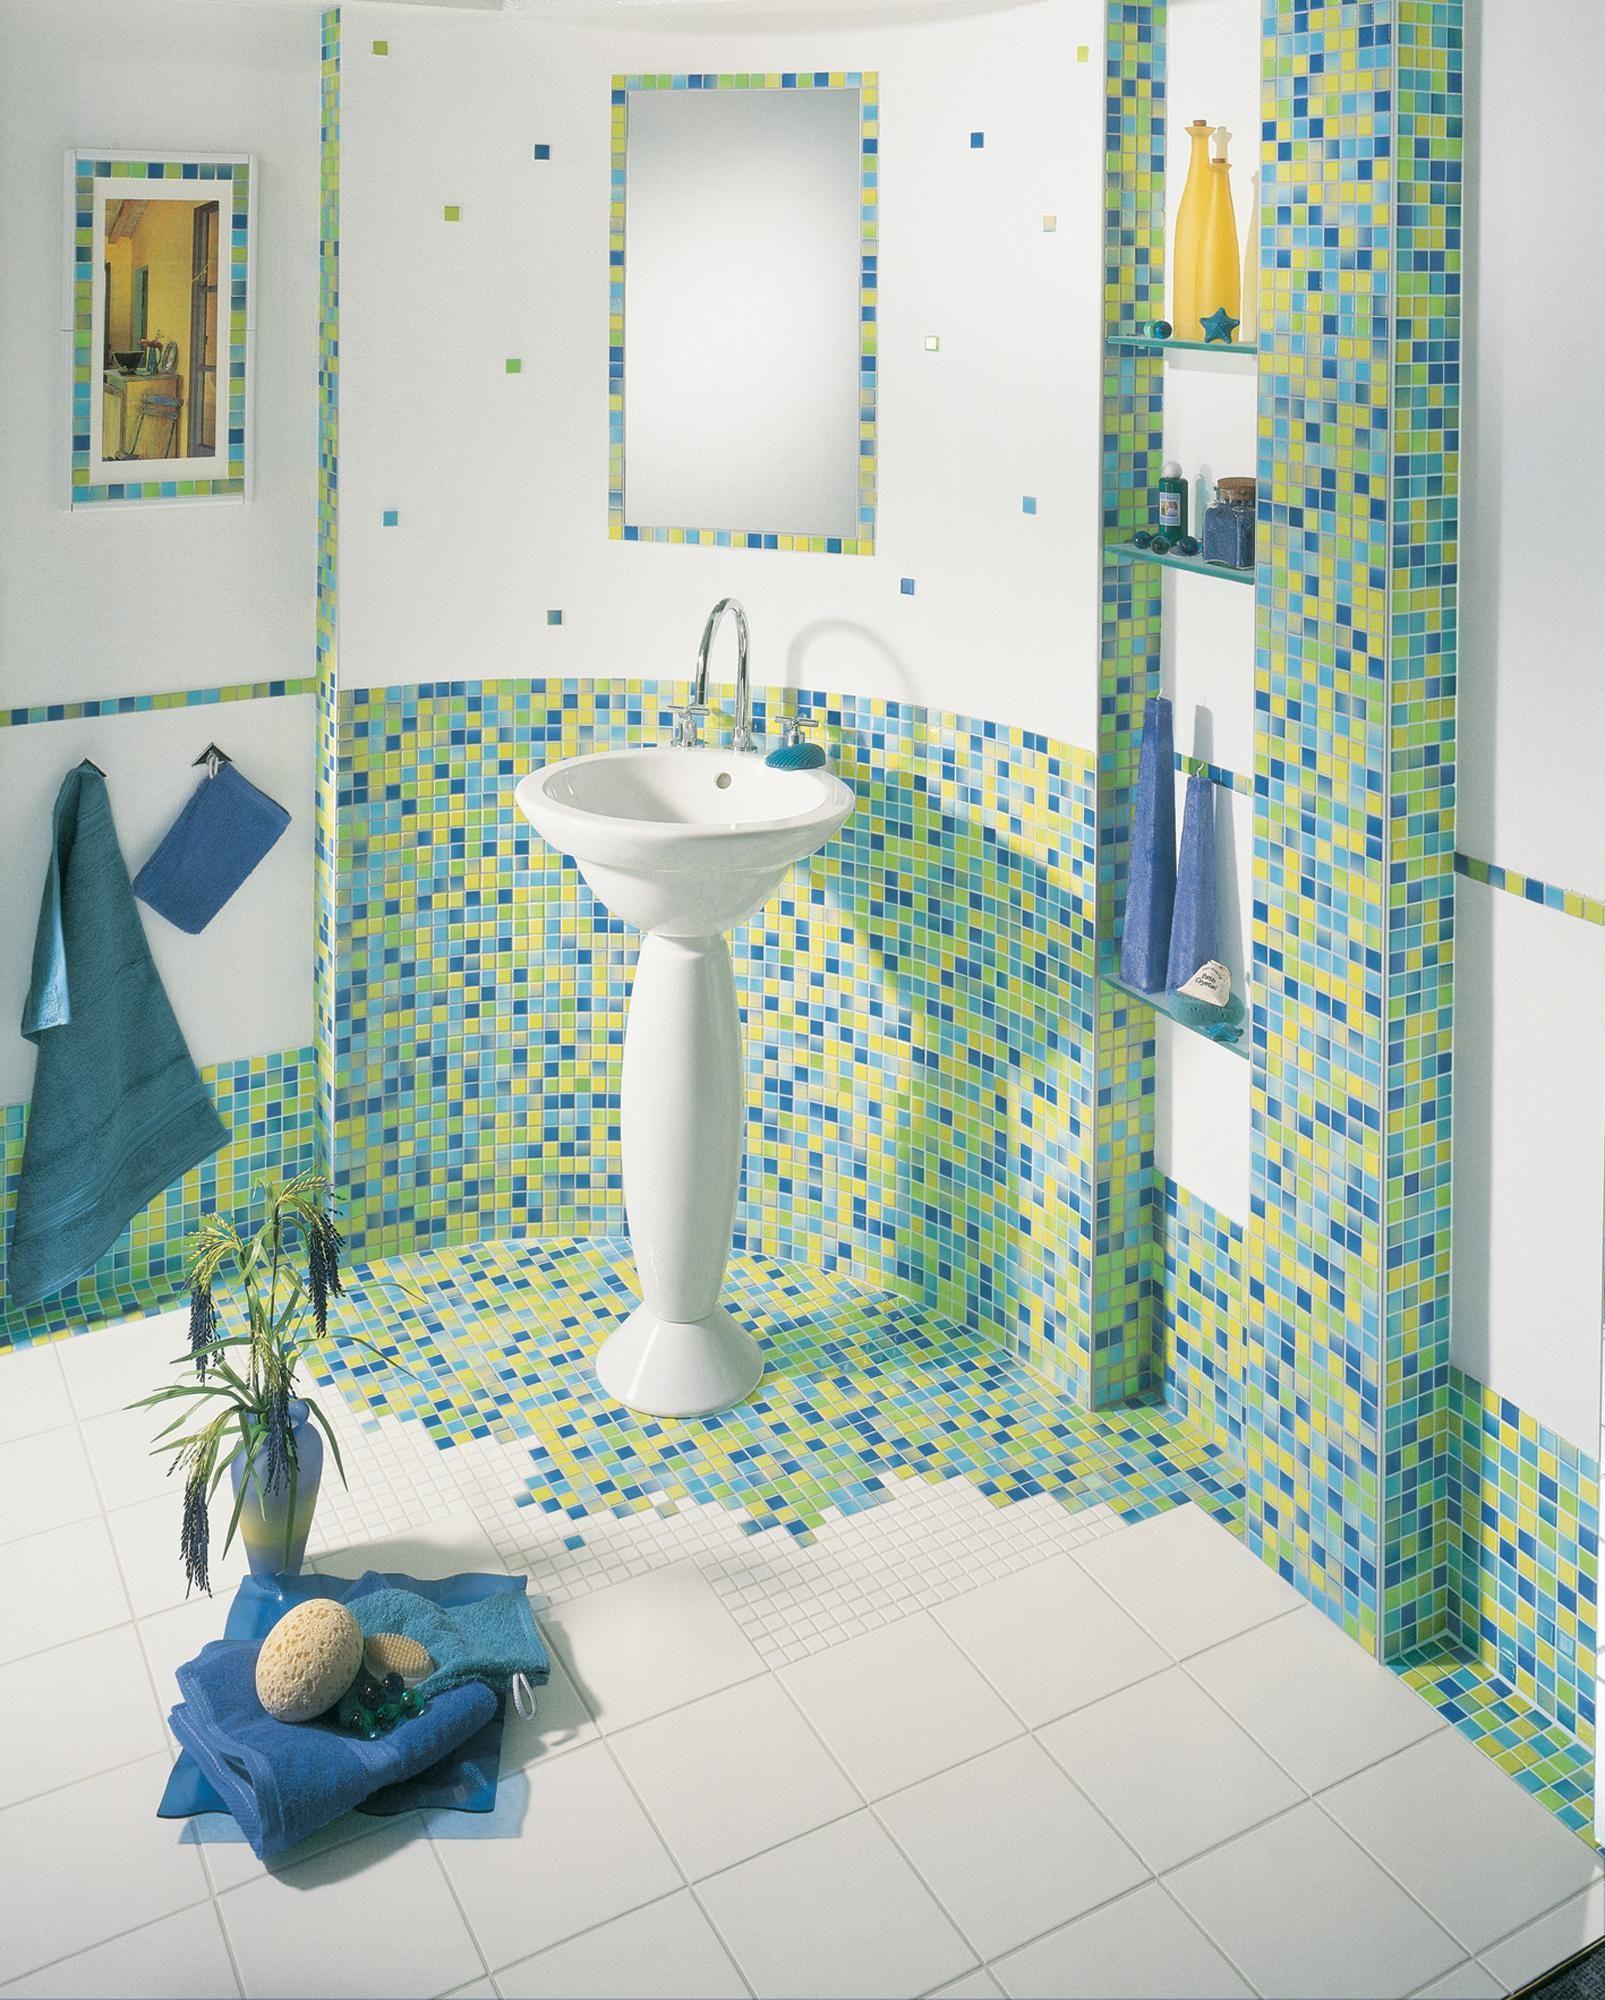 Wandgestaltung Fur Das Badezimmer Bilder Ideen Badezimmer Fliesen Badezimmer Badezimmereinrichtung